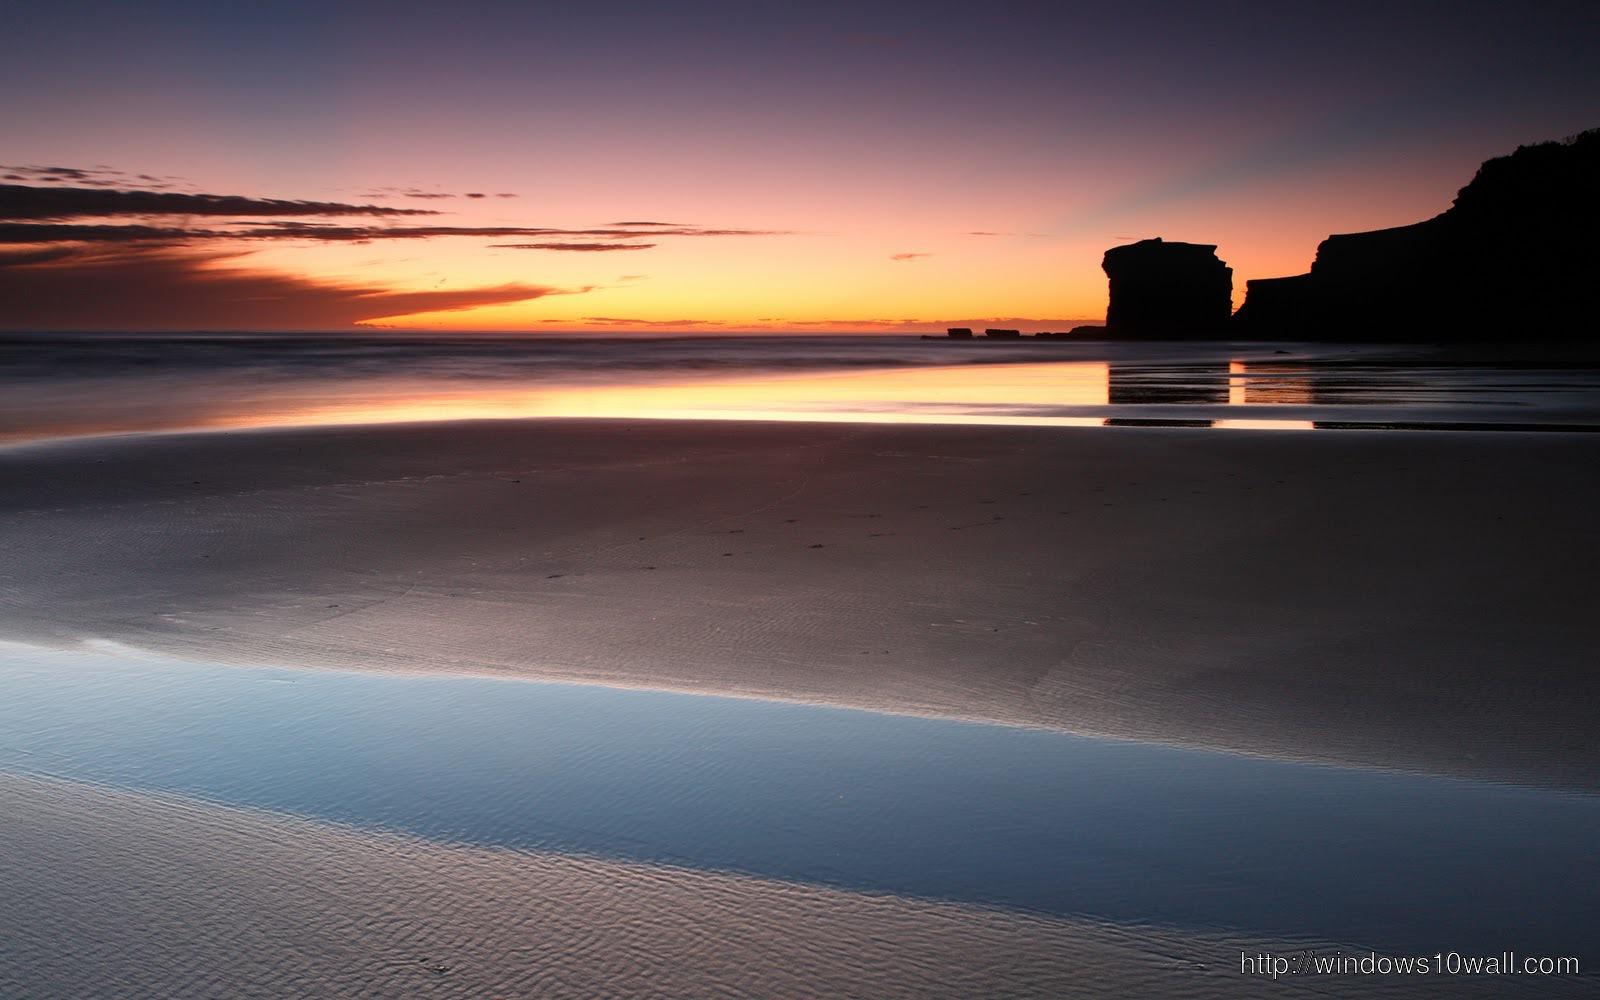 Beach Sunset Wallpaper Background Tumblr Windows 10 Wallpapers